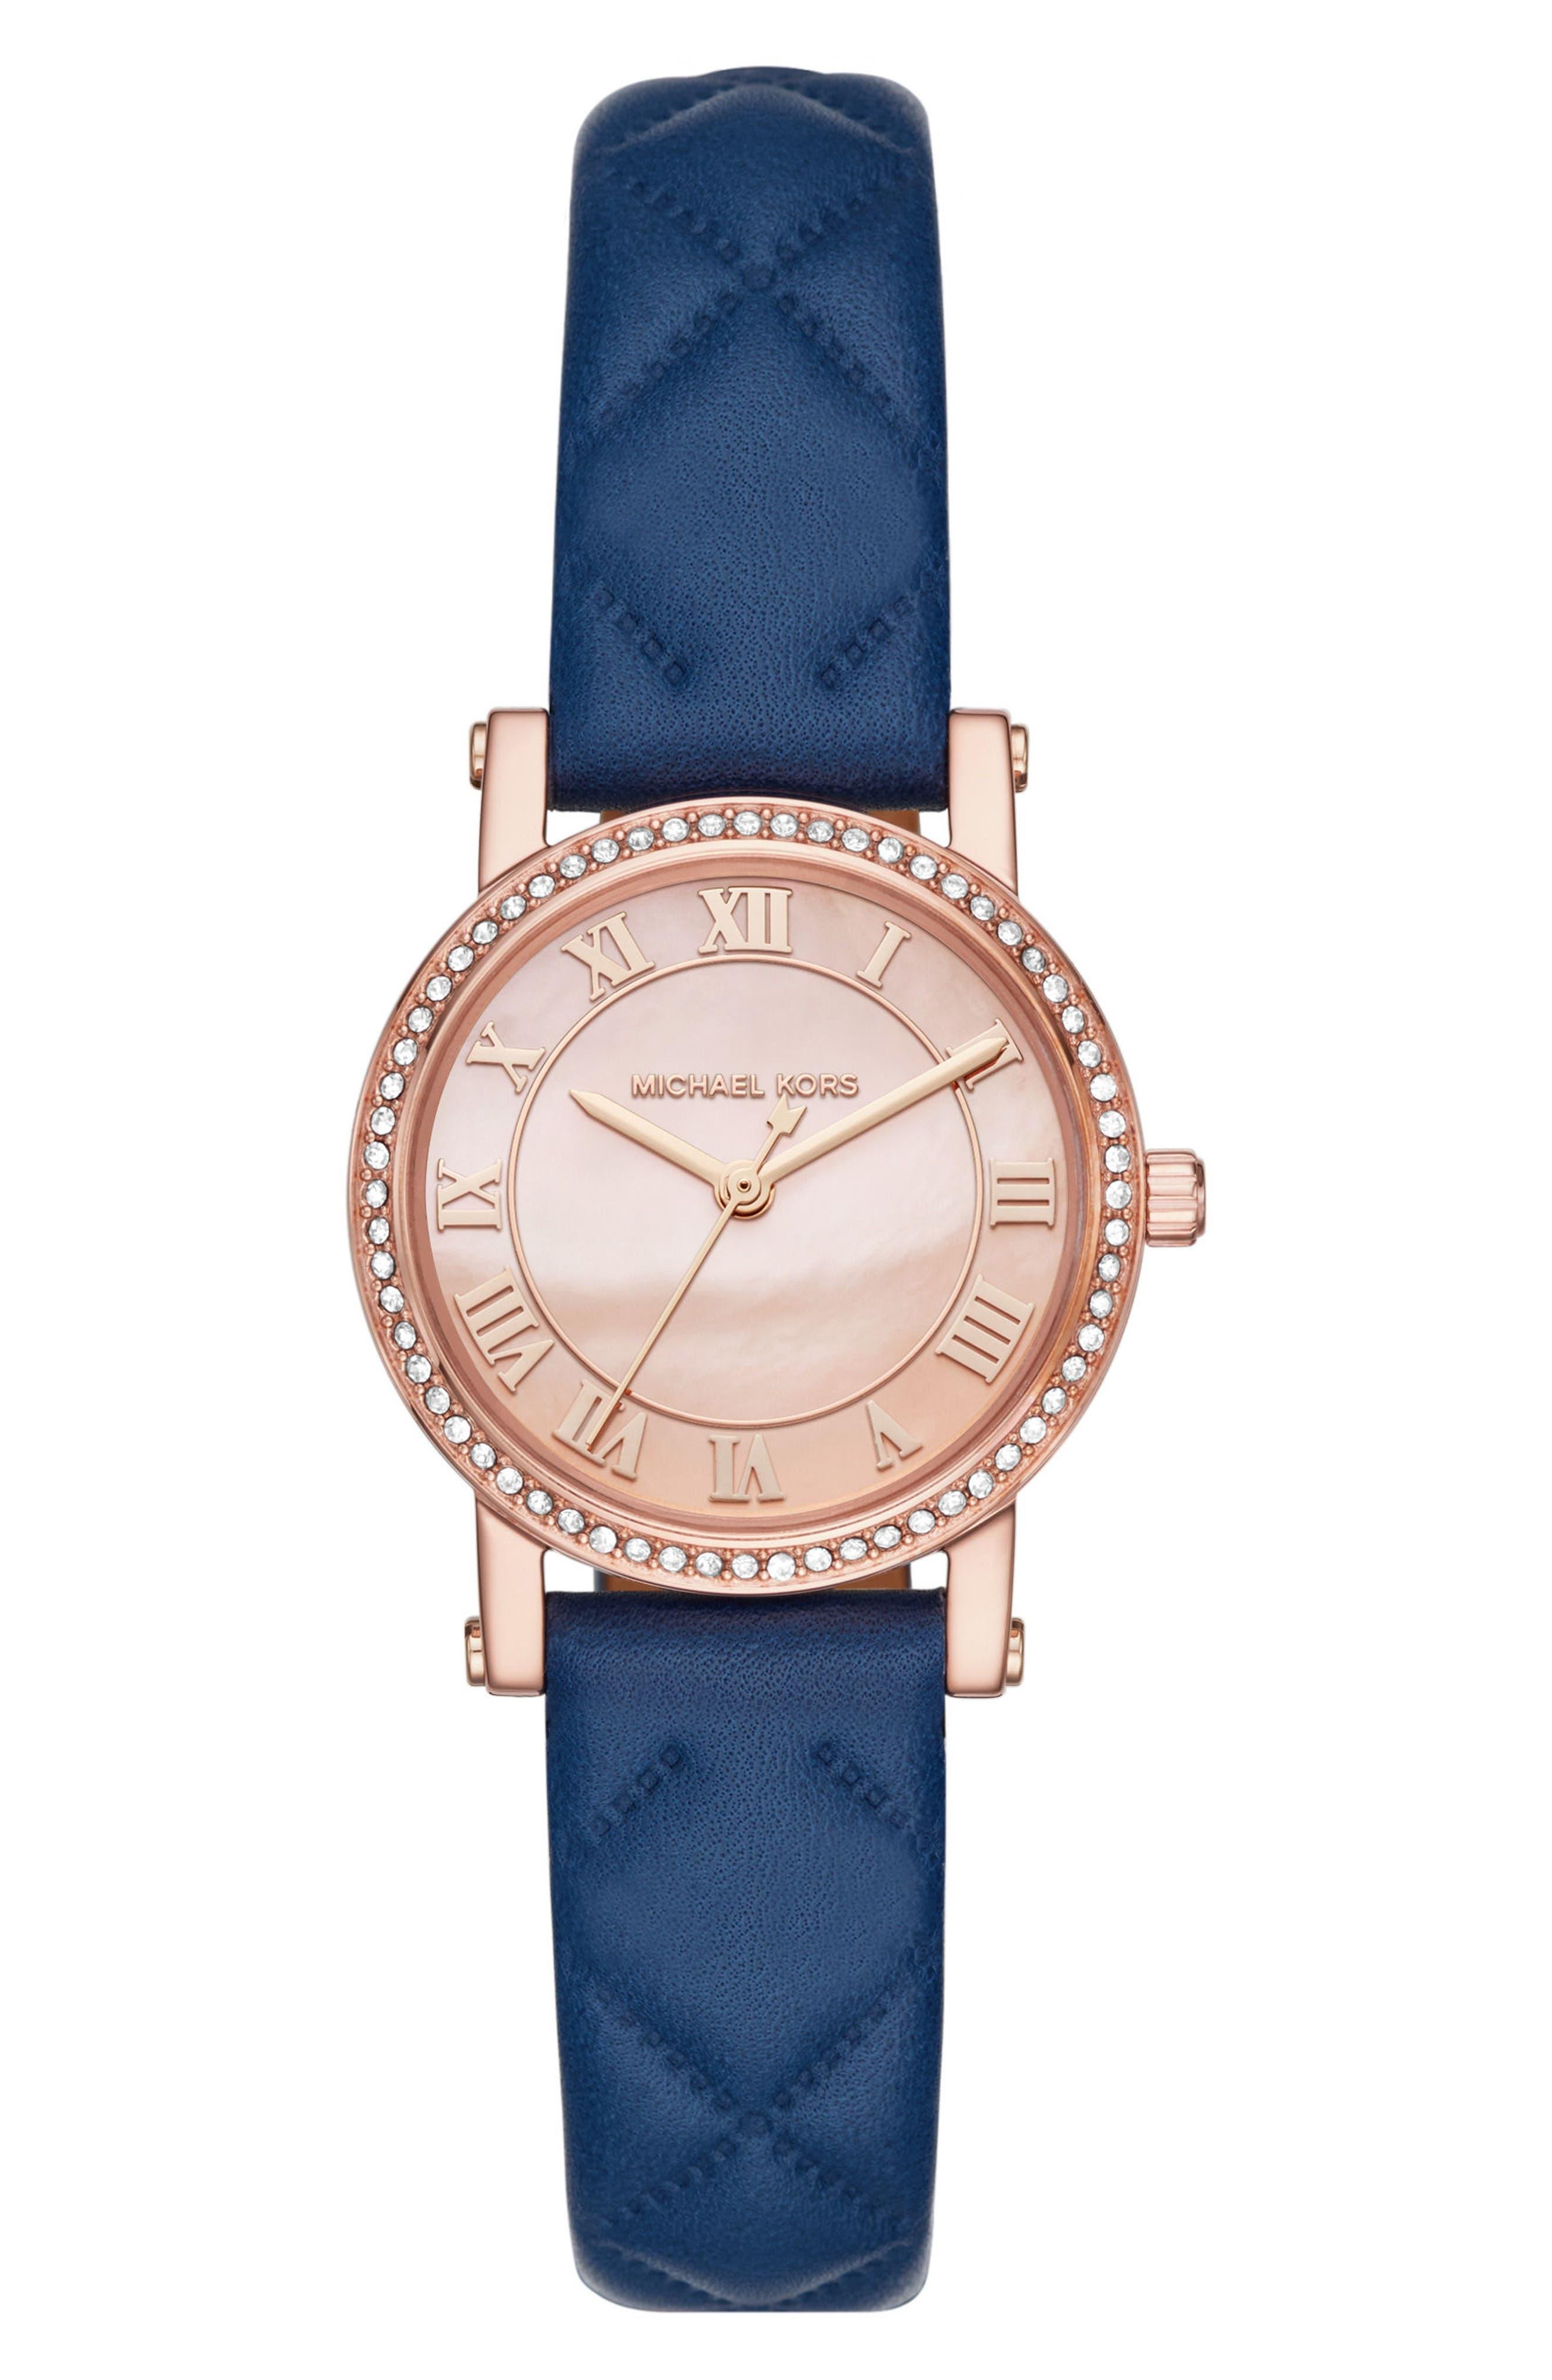 Main Image - Michael Kors Petite Norie Pavé Leather Strap Watch, 28mm